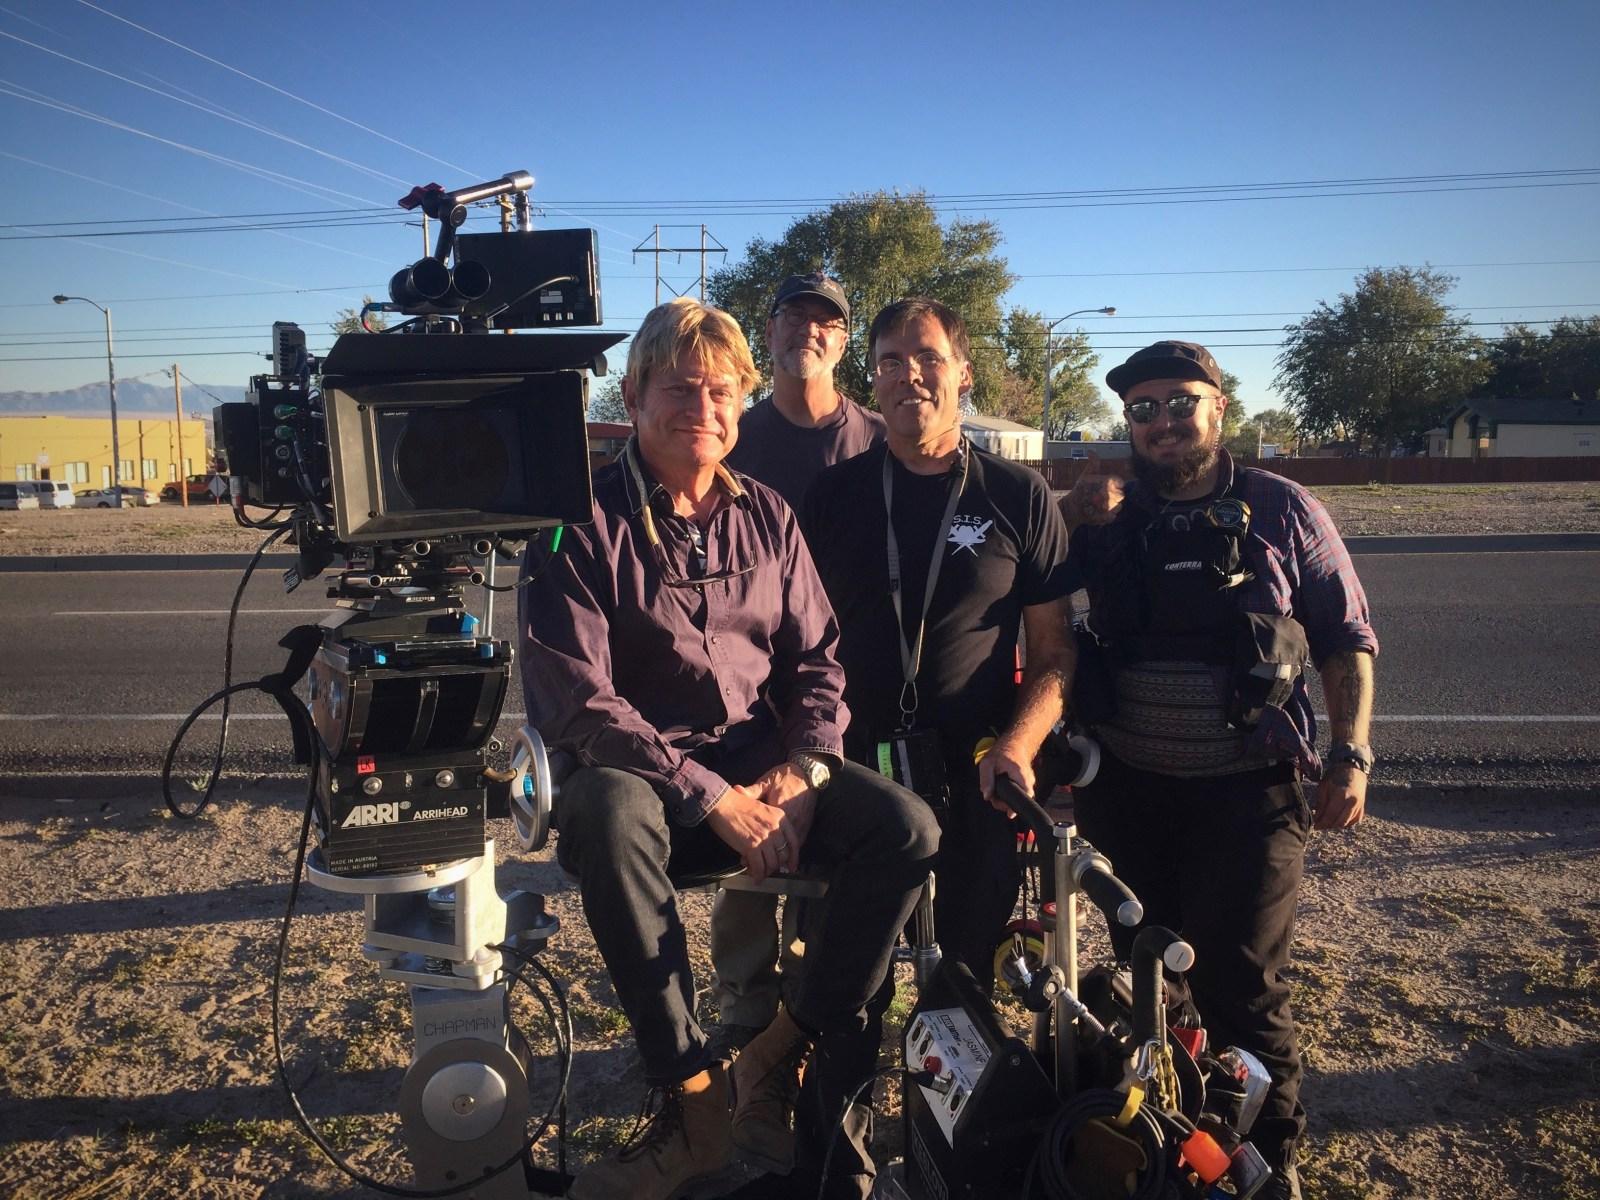 B Cam crew Behind the Scenes